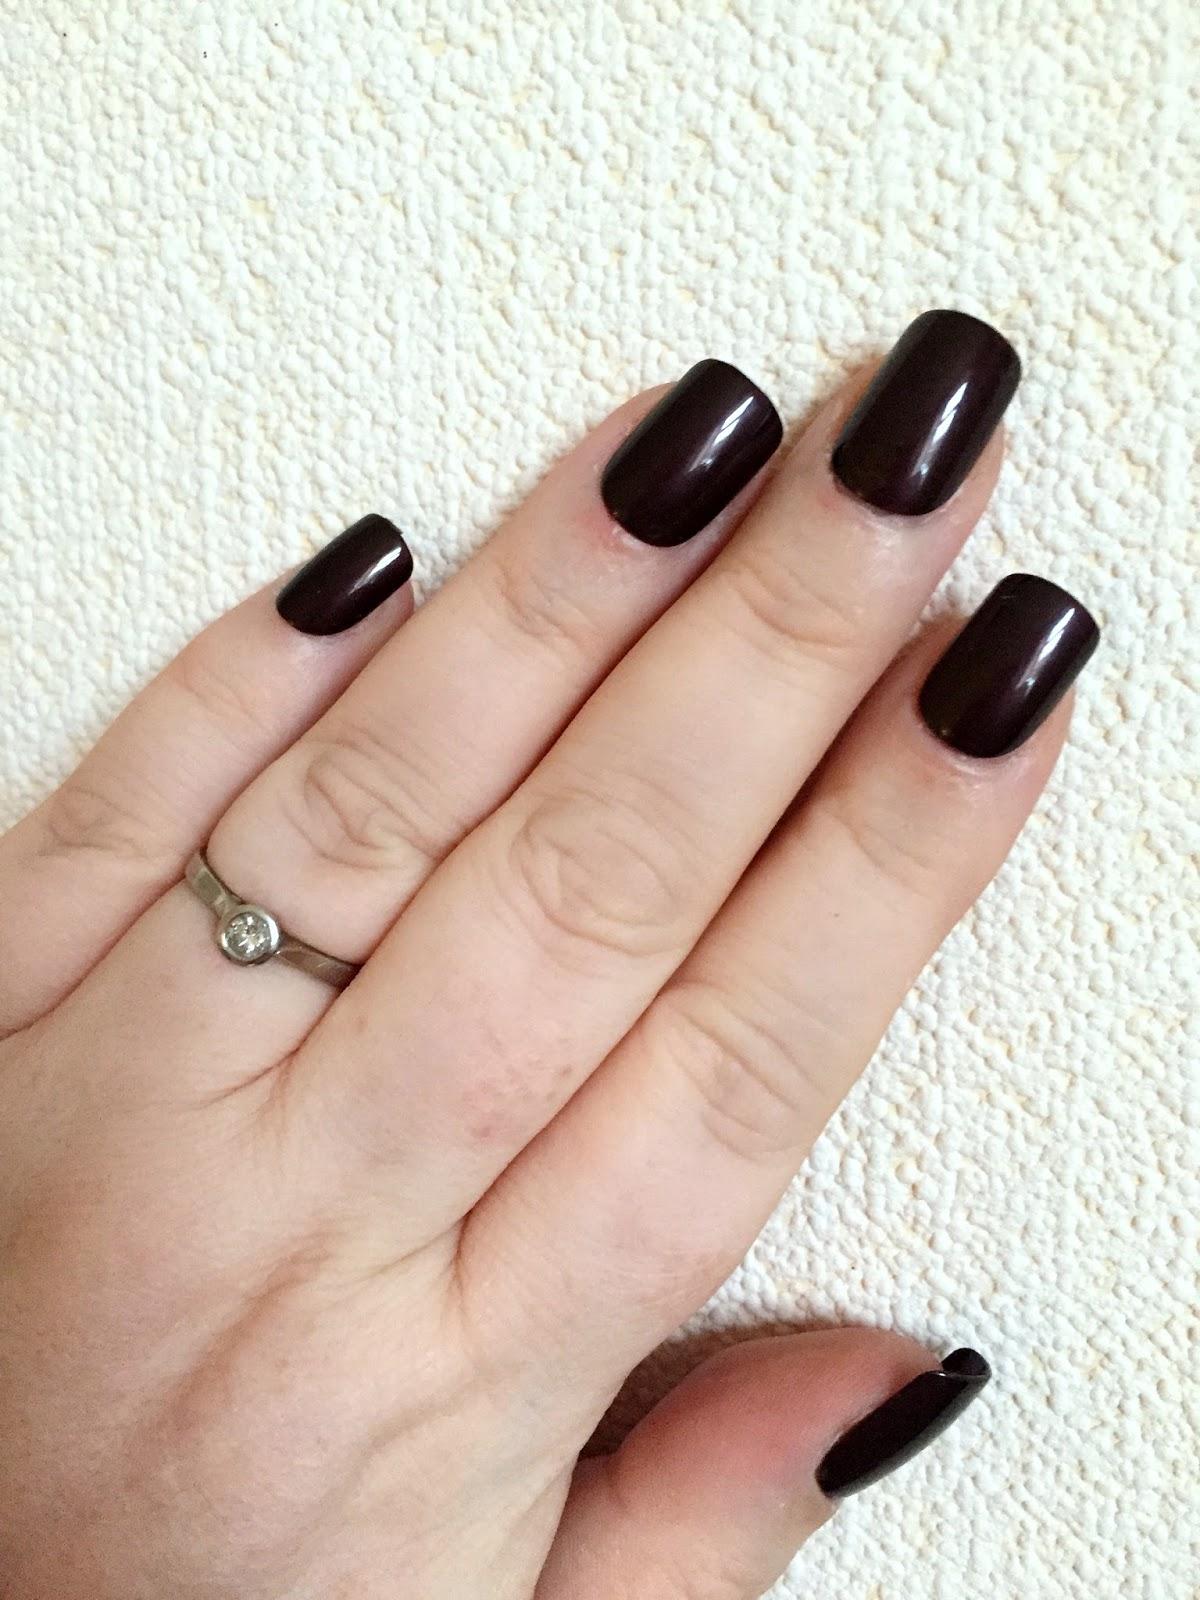 Kiss Gel Fantasy Nails - Mammaful Zo: Beauty, Fashion ...